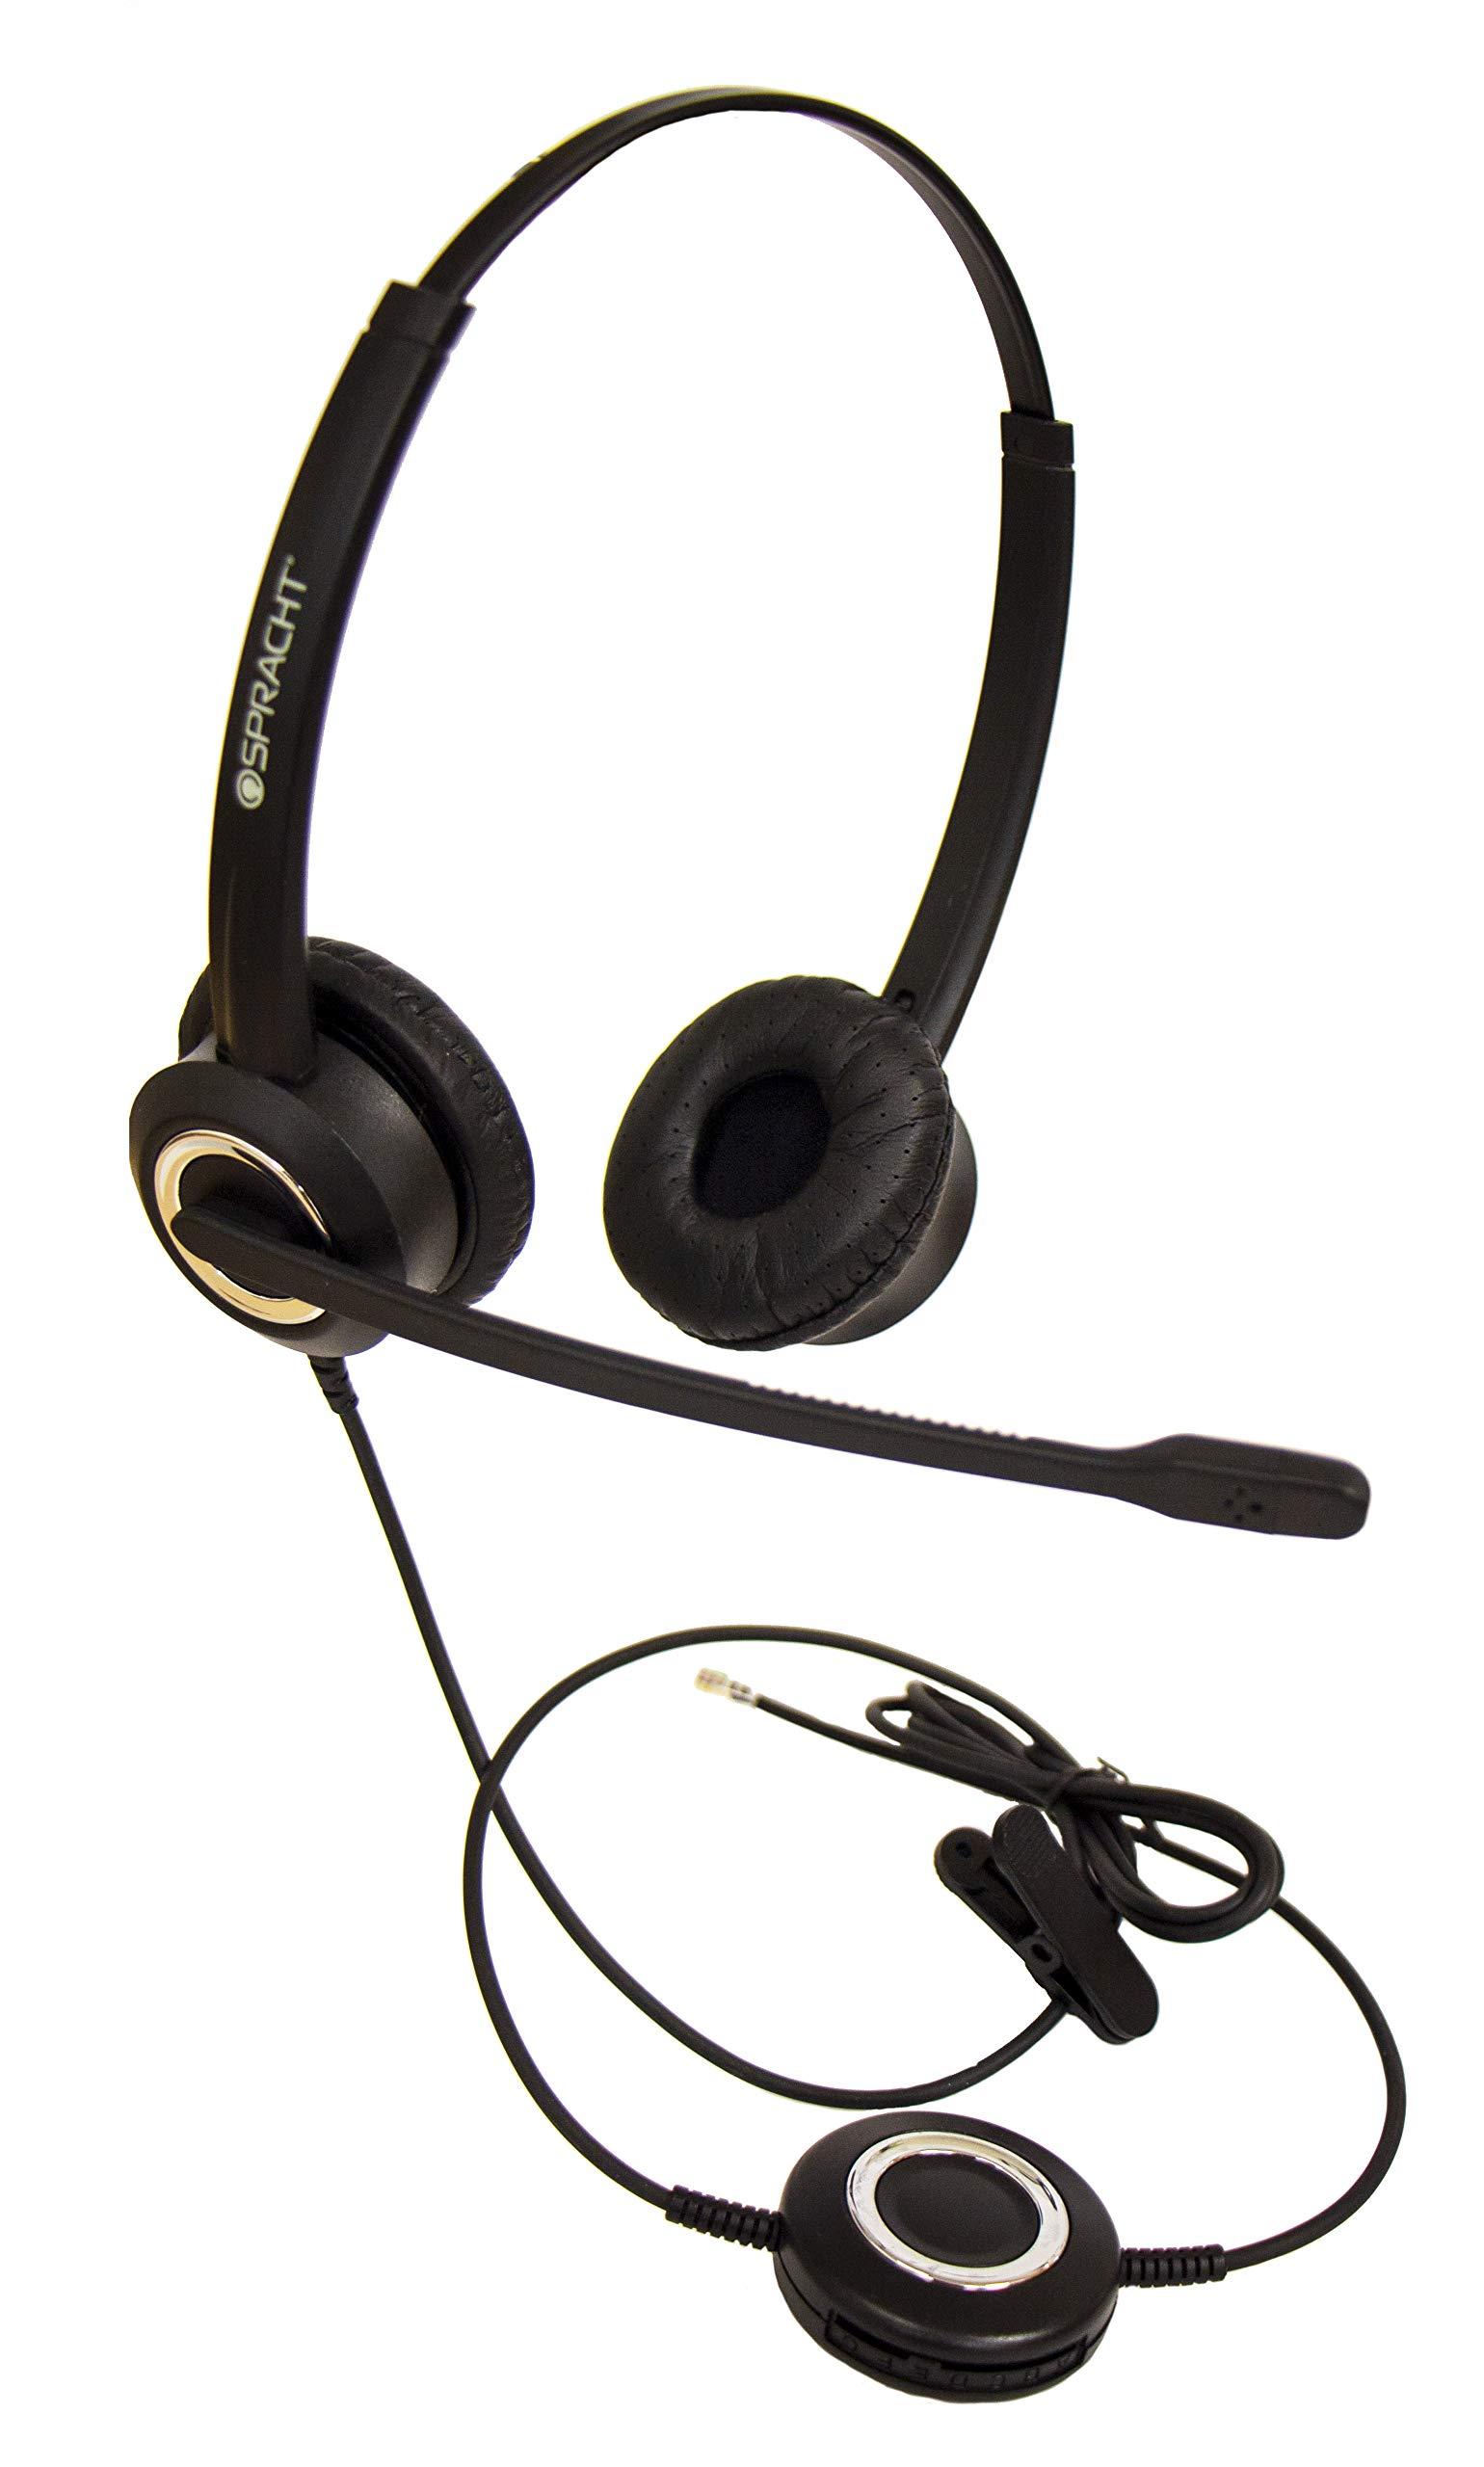 Zum RJ9B Universal Desktop Headset - Bi-naural by Spracht